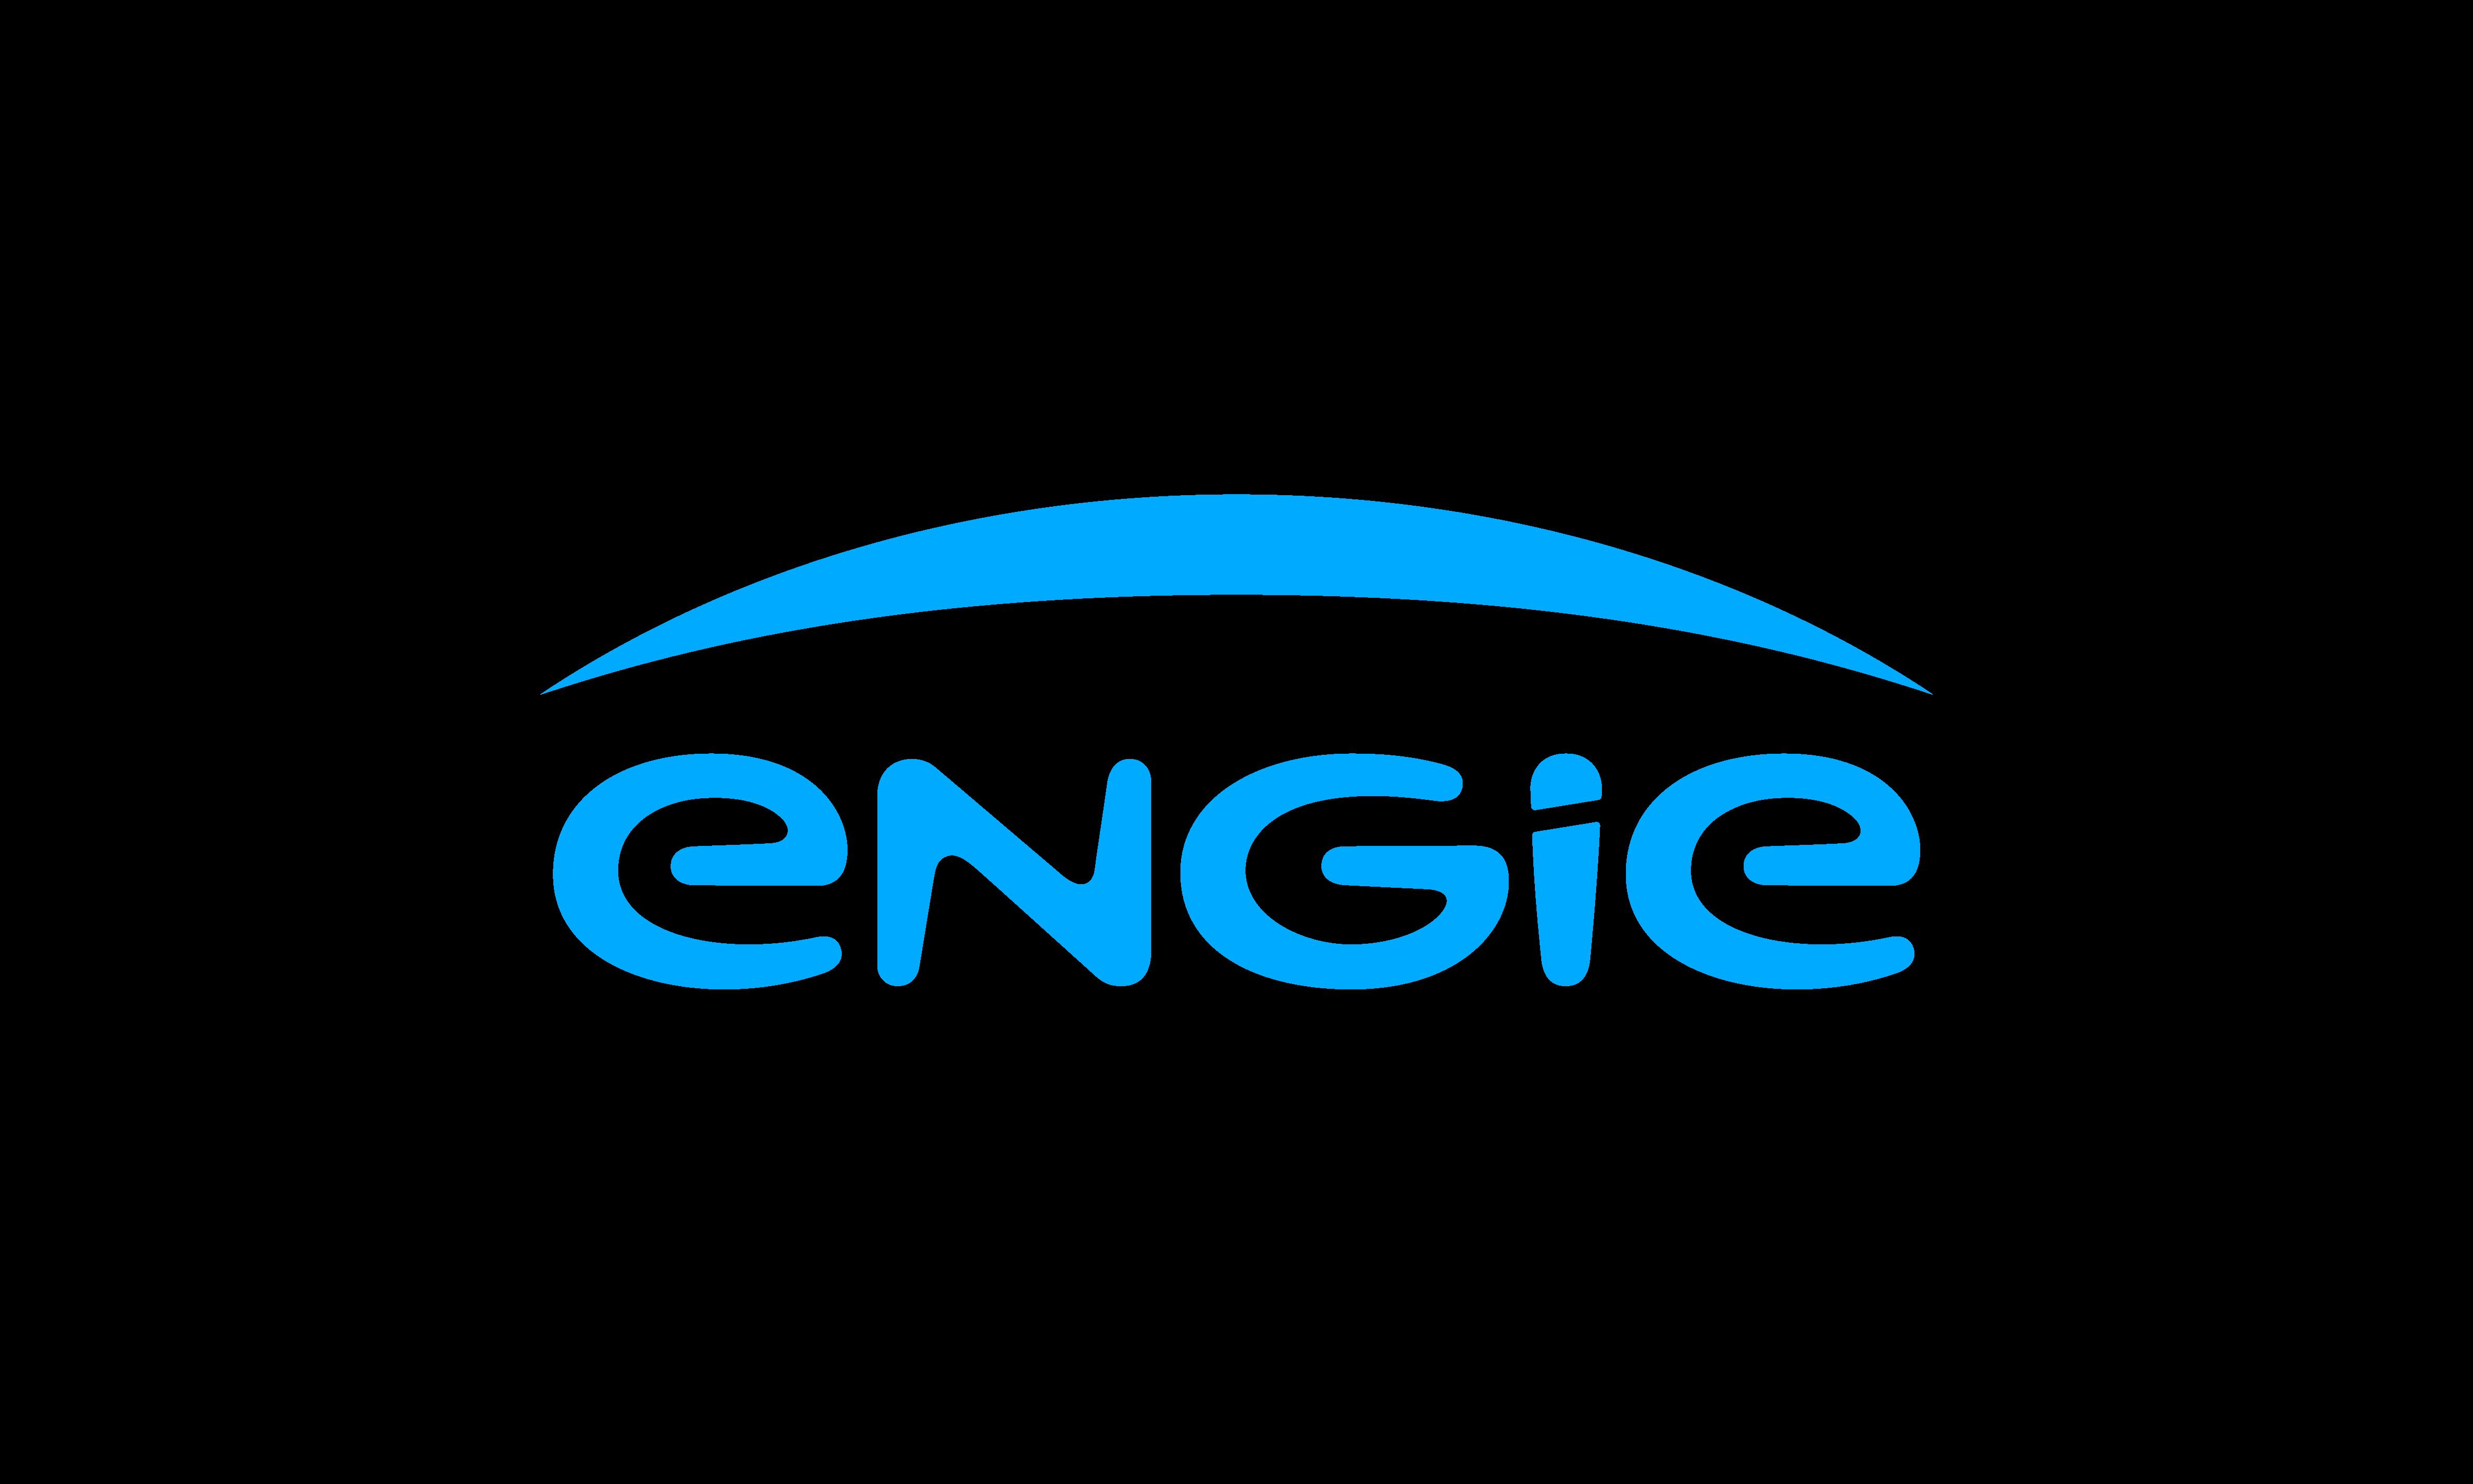 Engie : Brand Short Description Type Here.